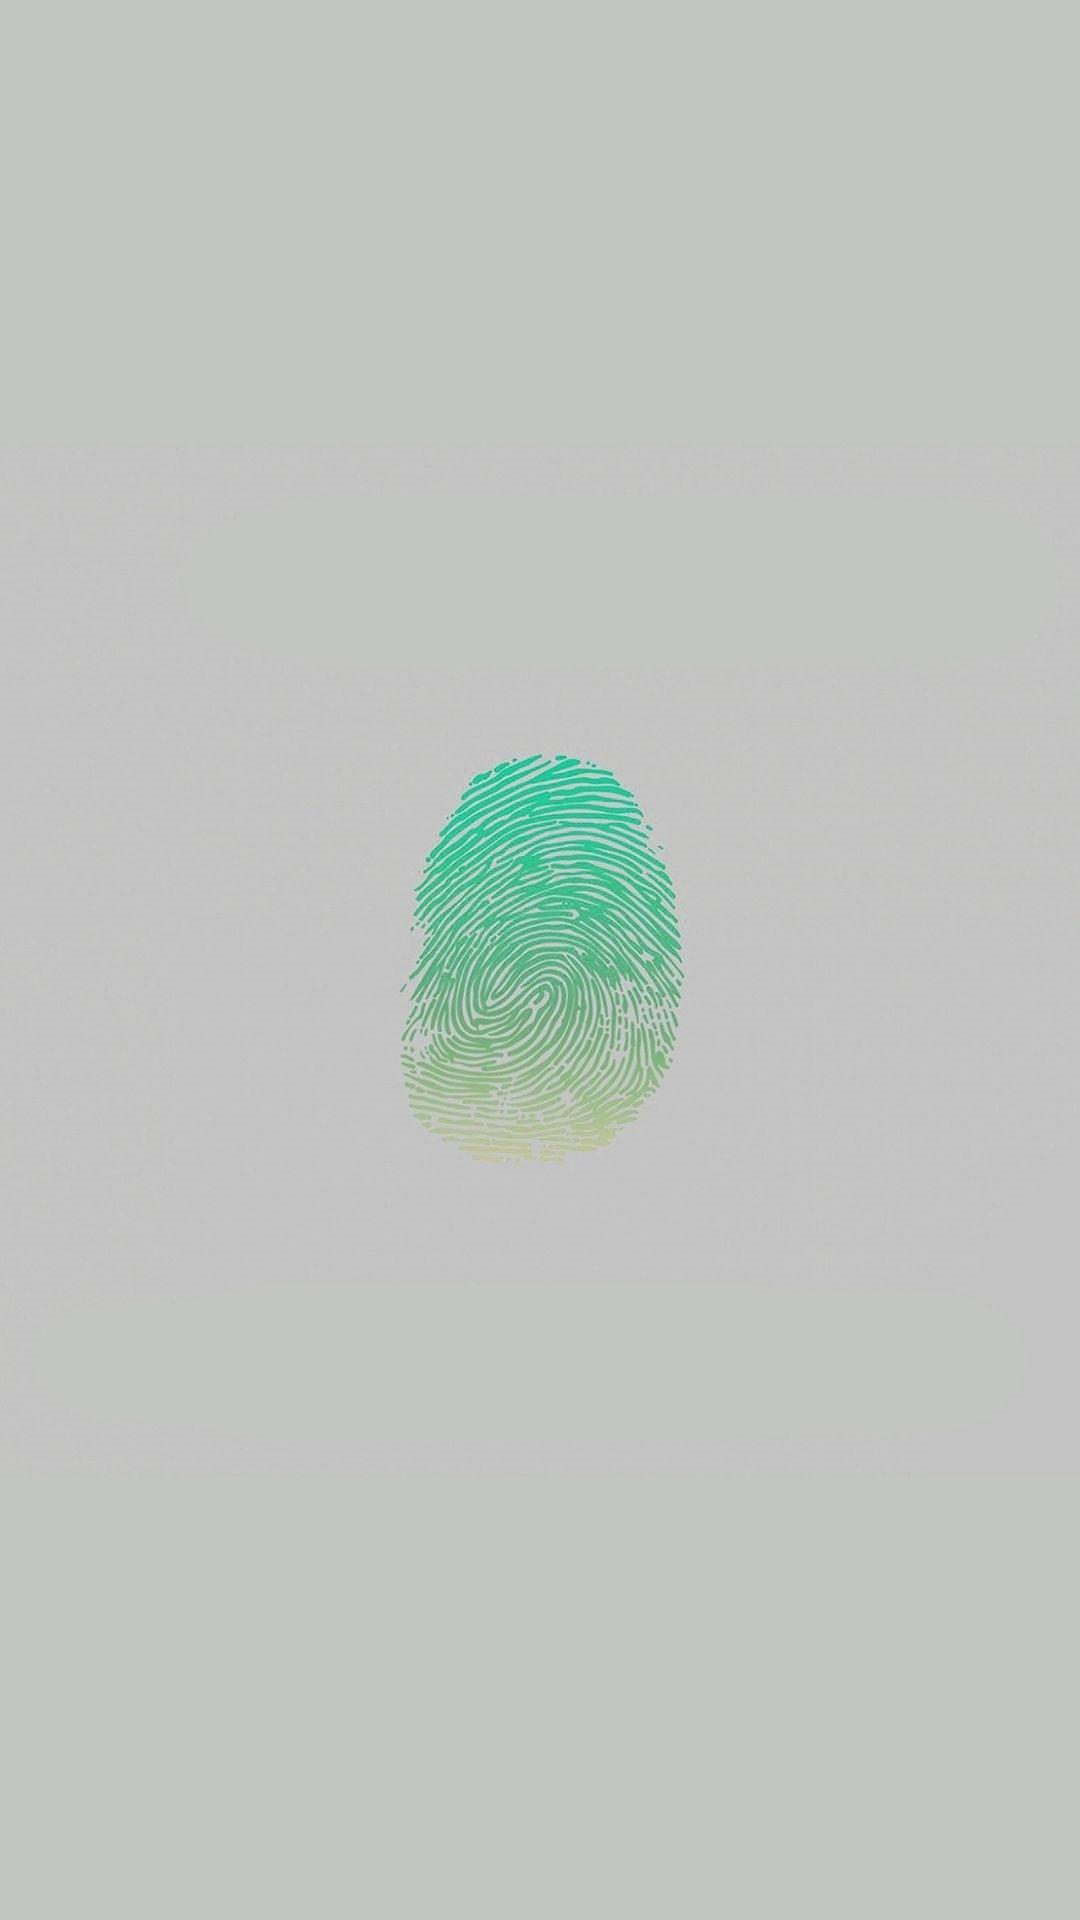 Minimalist hd wallpaper for mobile